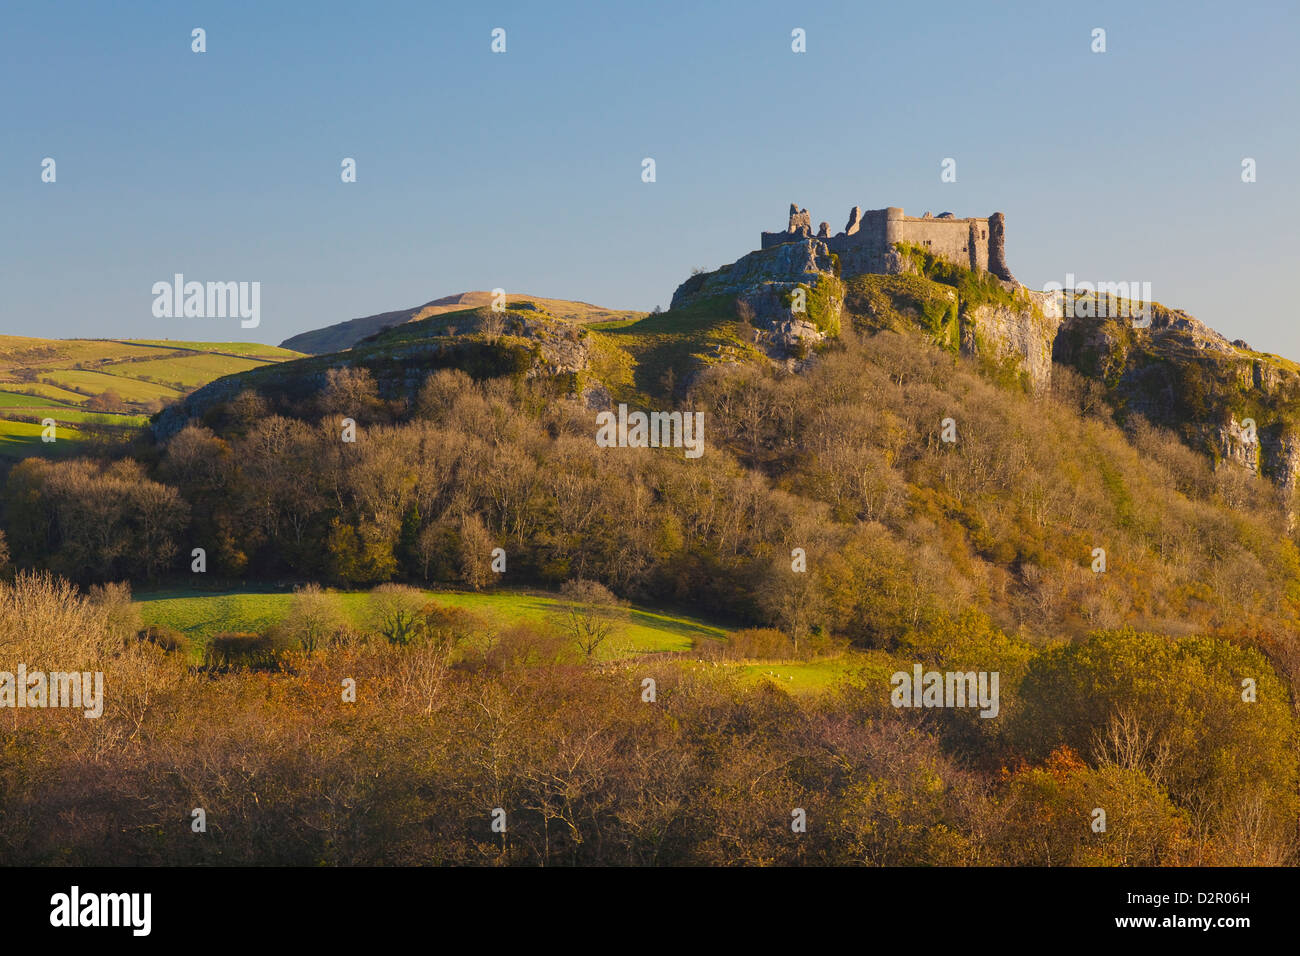 Position Cennen Castle, Brecon Beacons National Park, Wales, Vereinigtes Königreich, Europa Stockbild